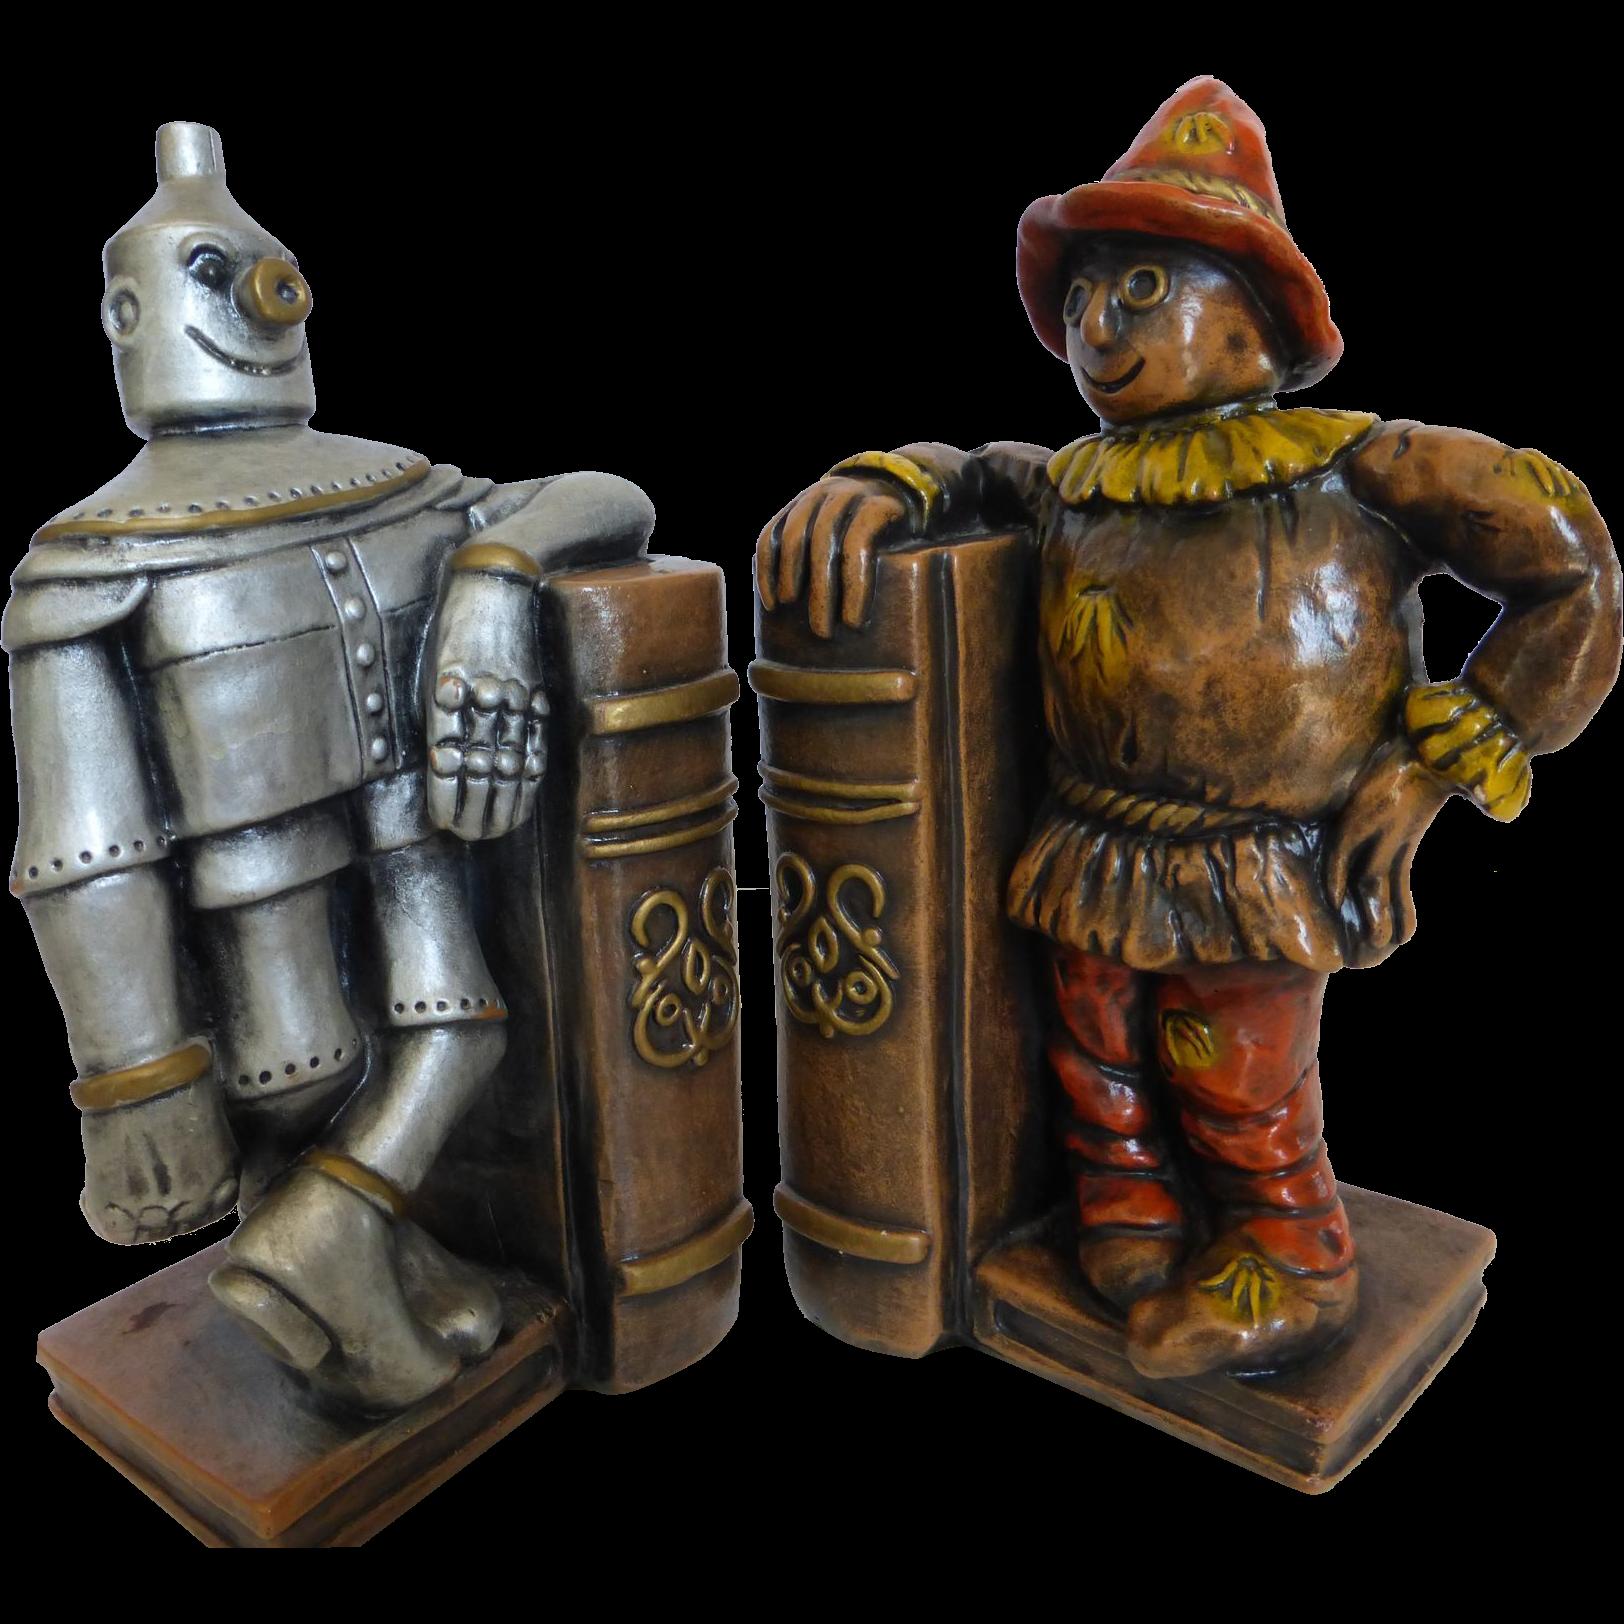 Wizard Of Oz Chalk Ware Bookends Progressive Art Products